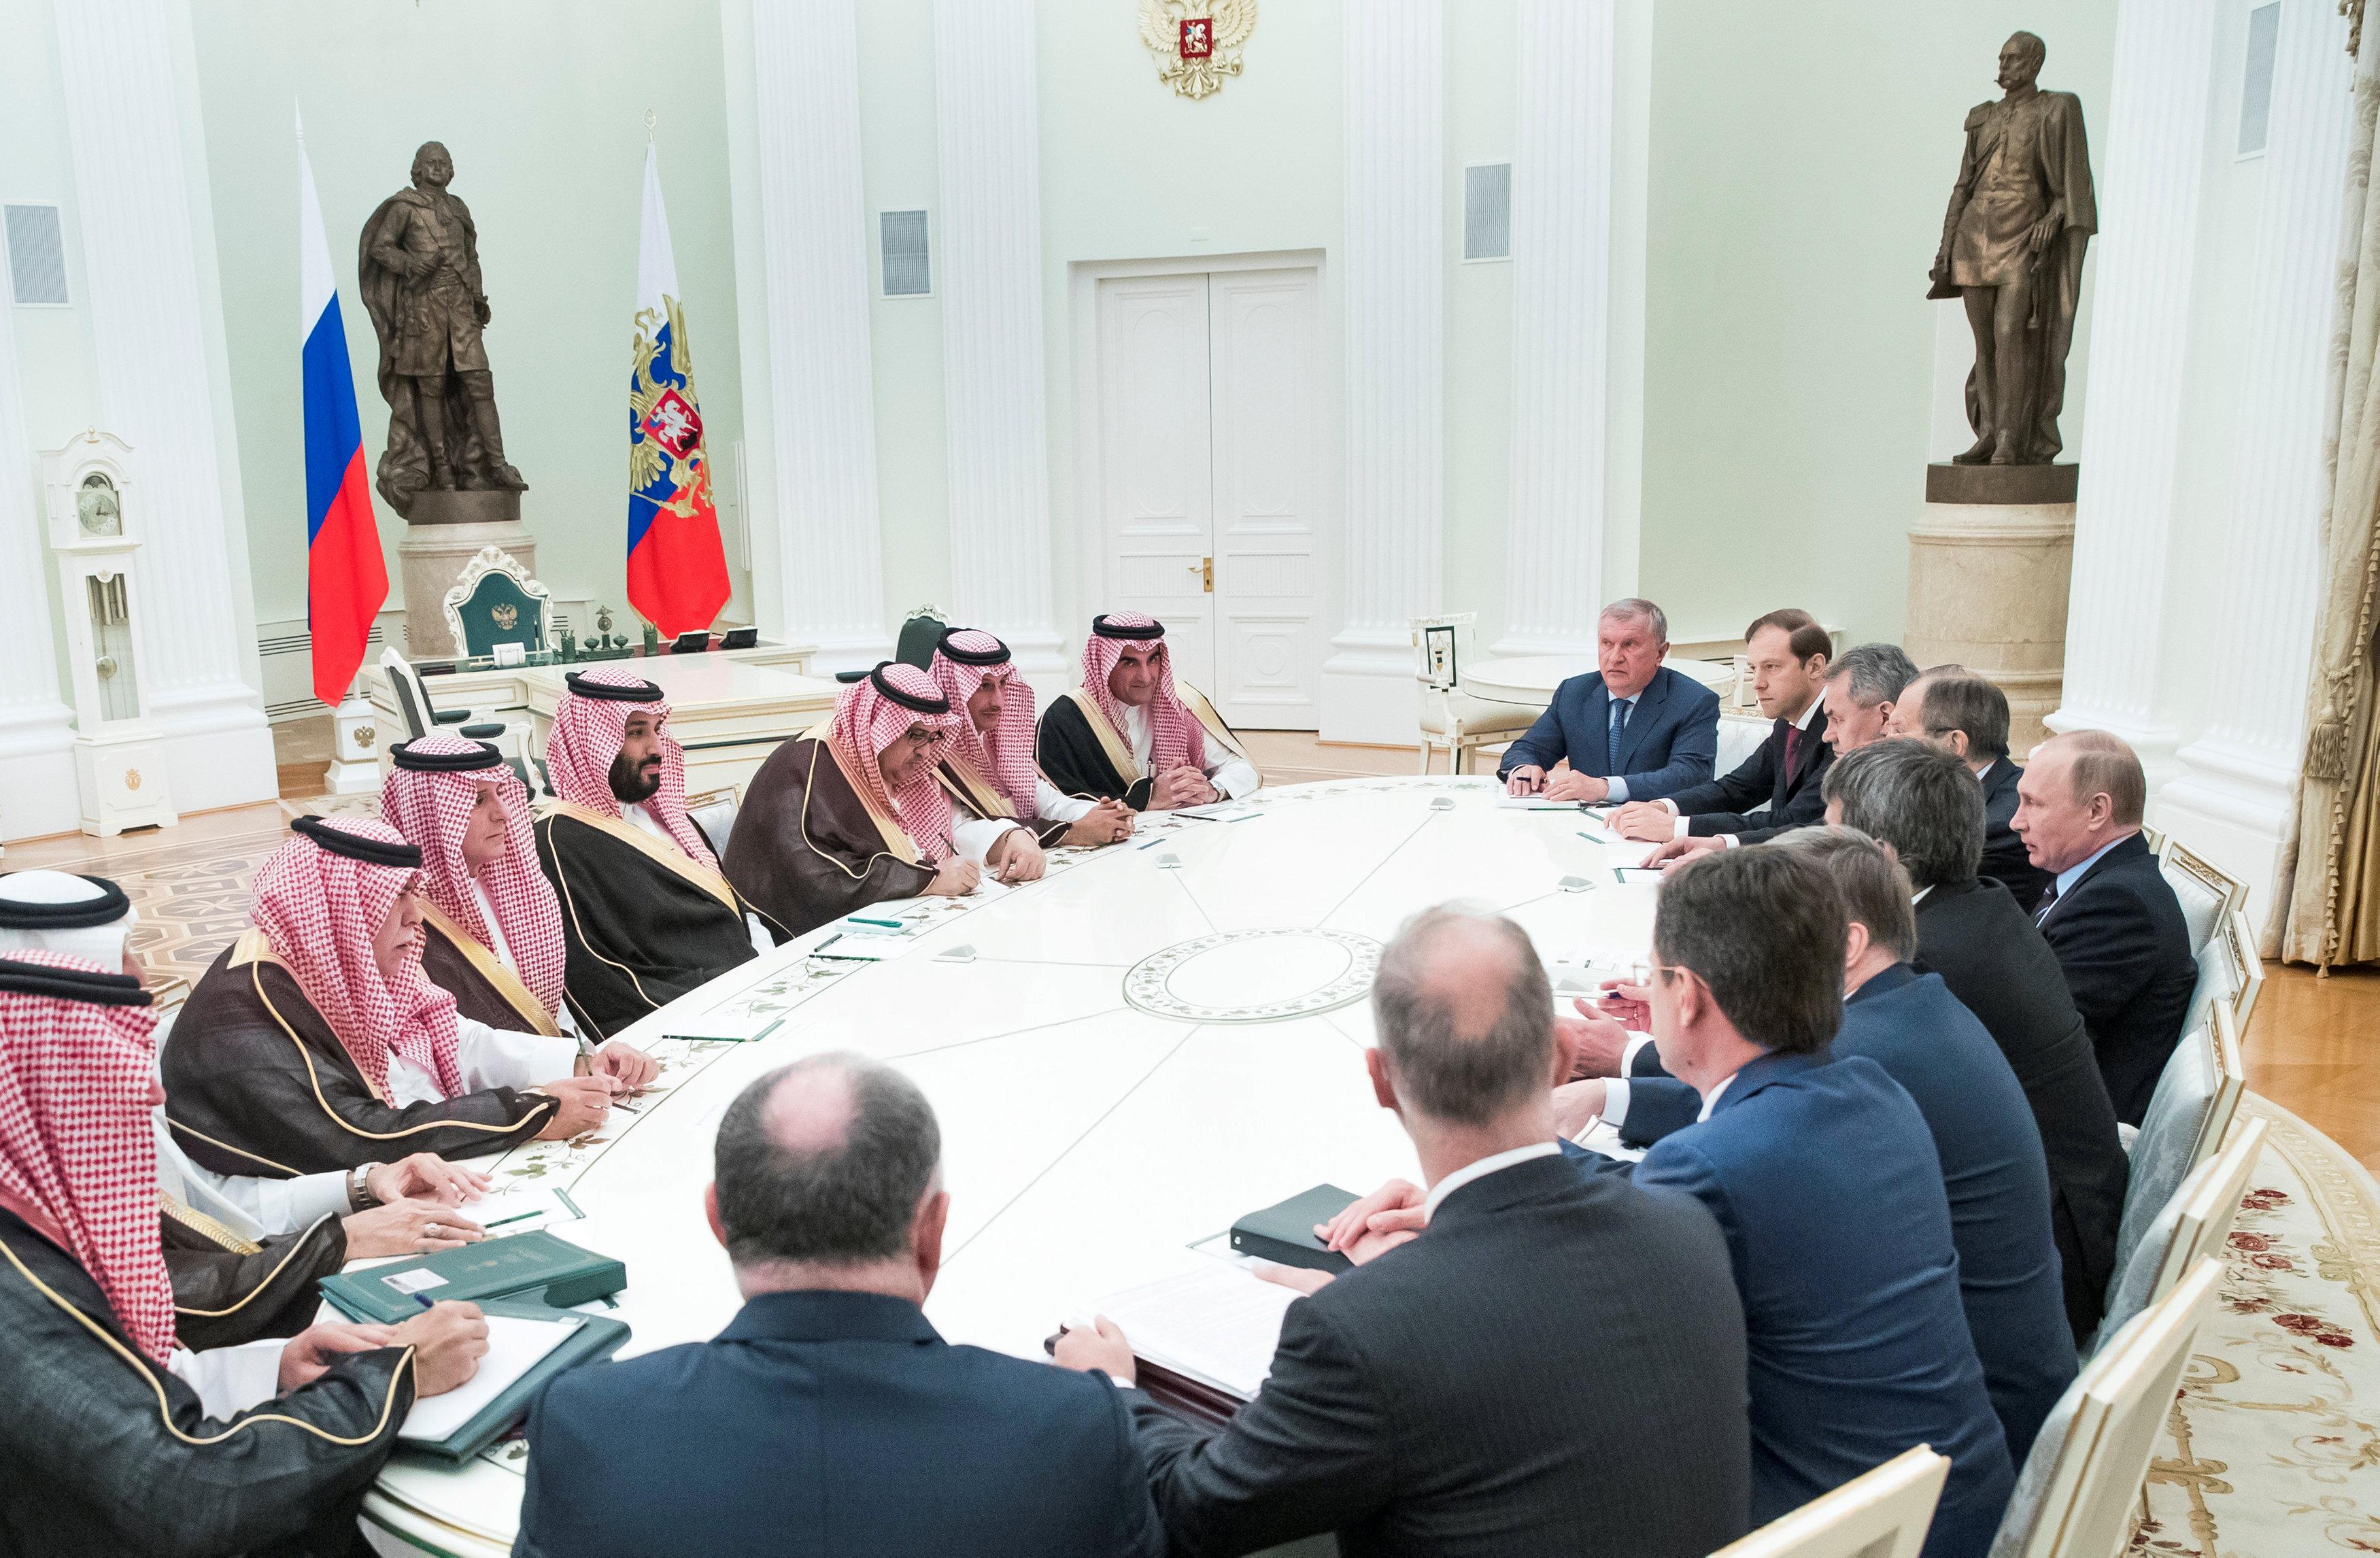 Saudi investors eye Russian Arctic LNG